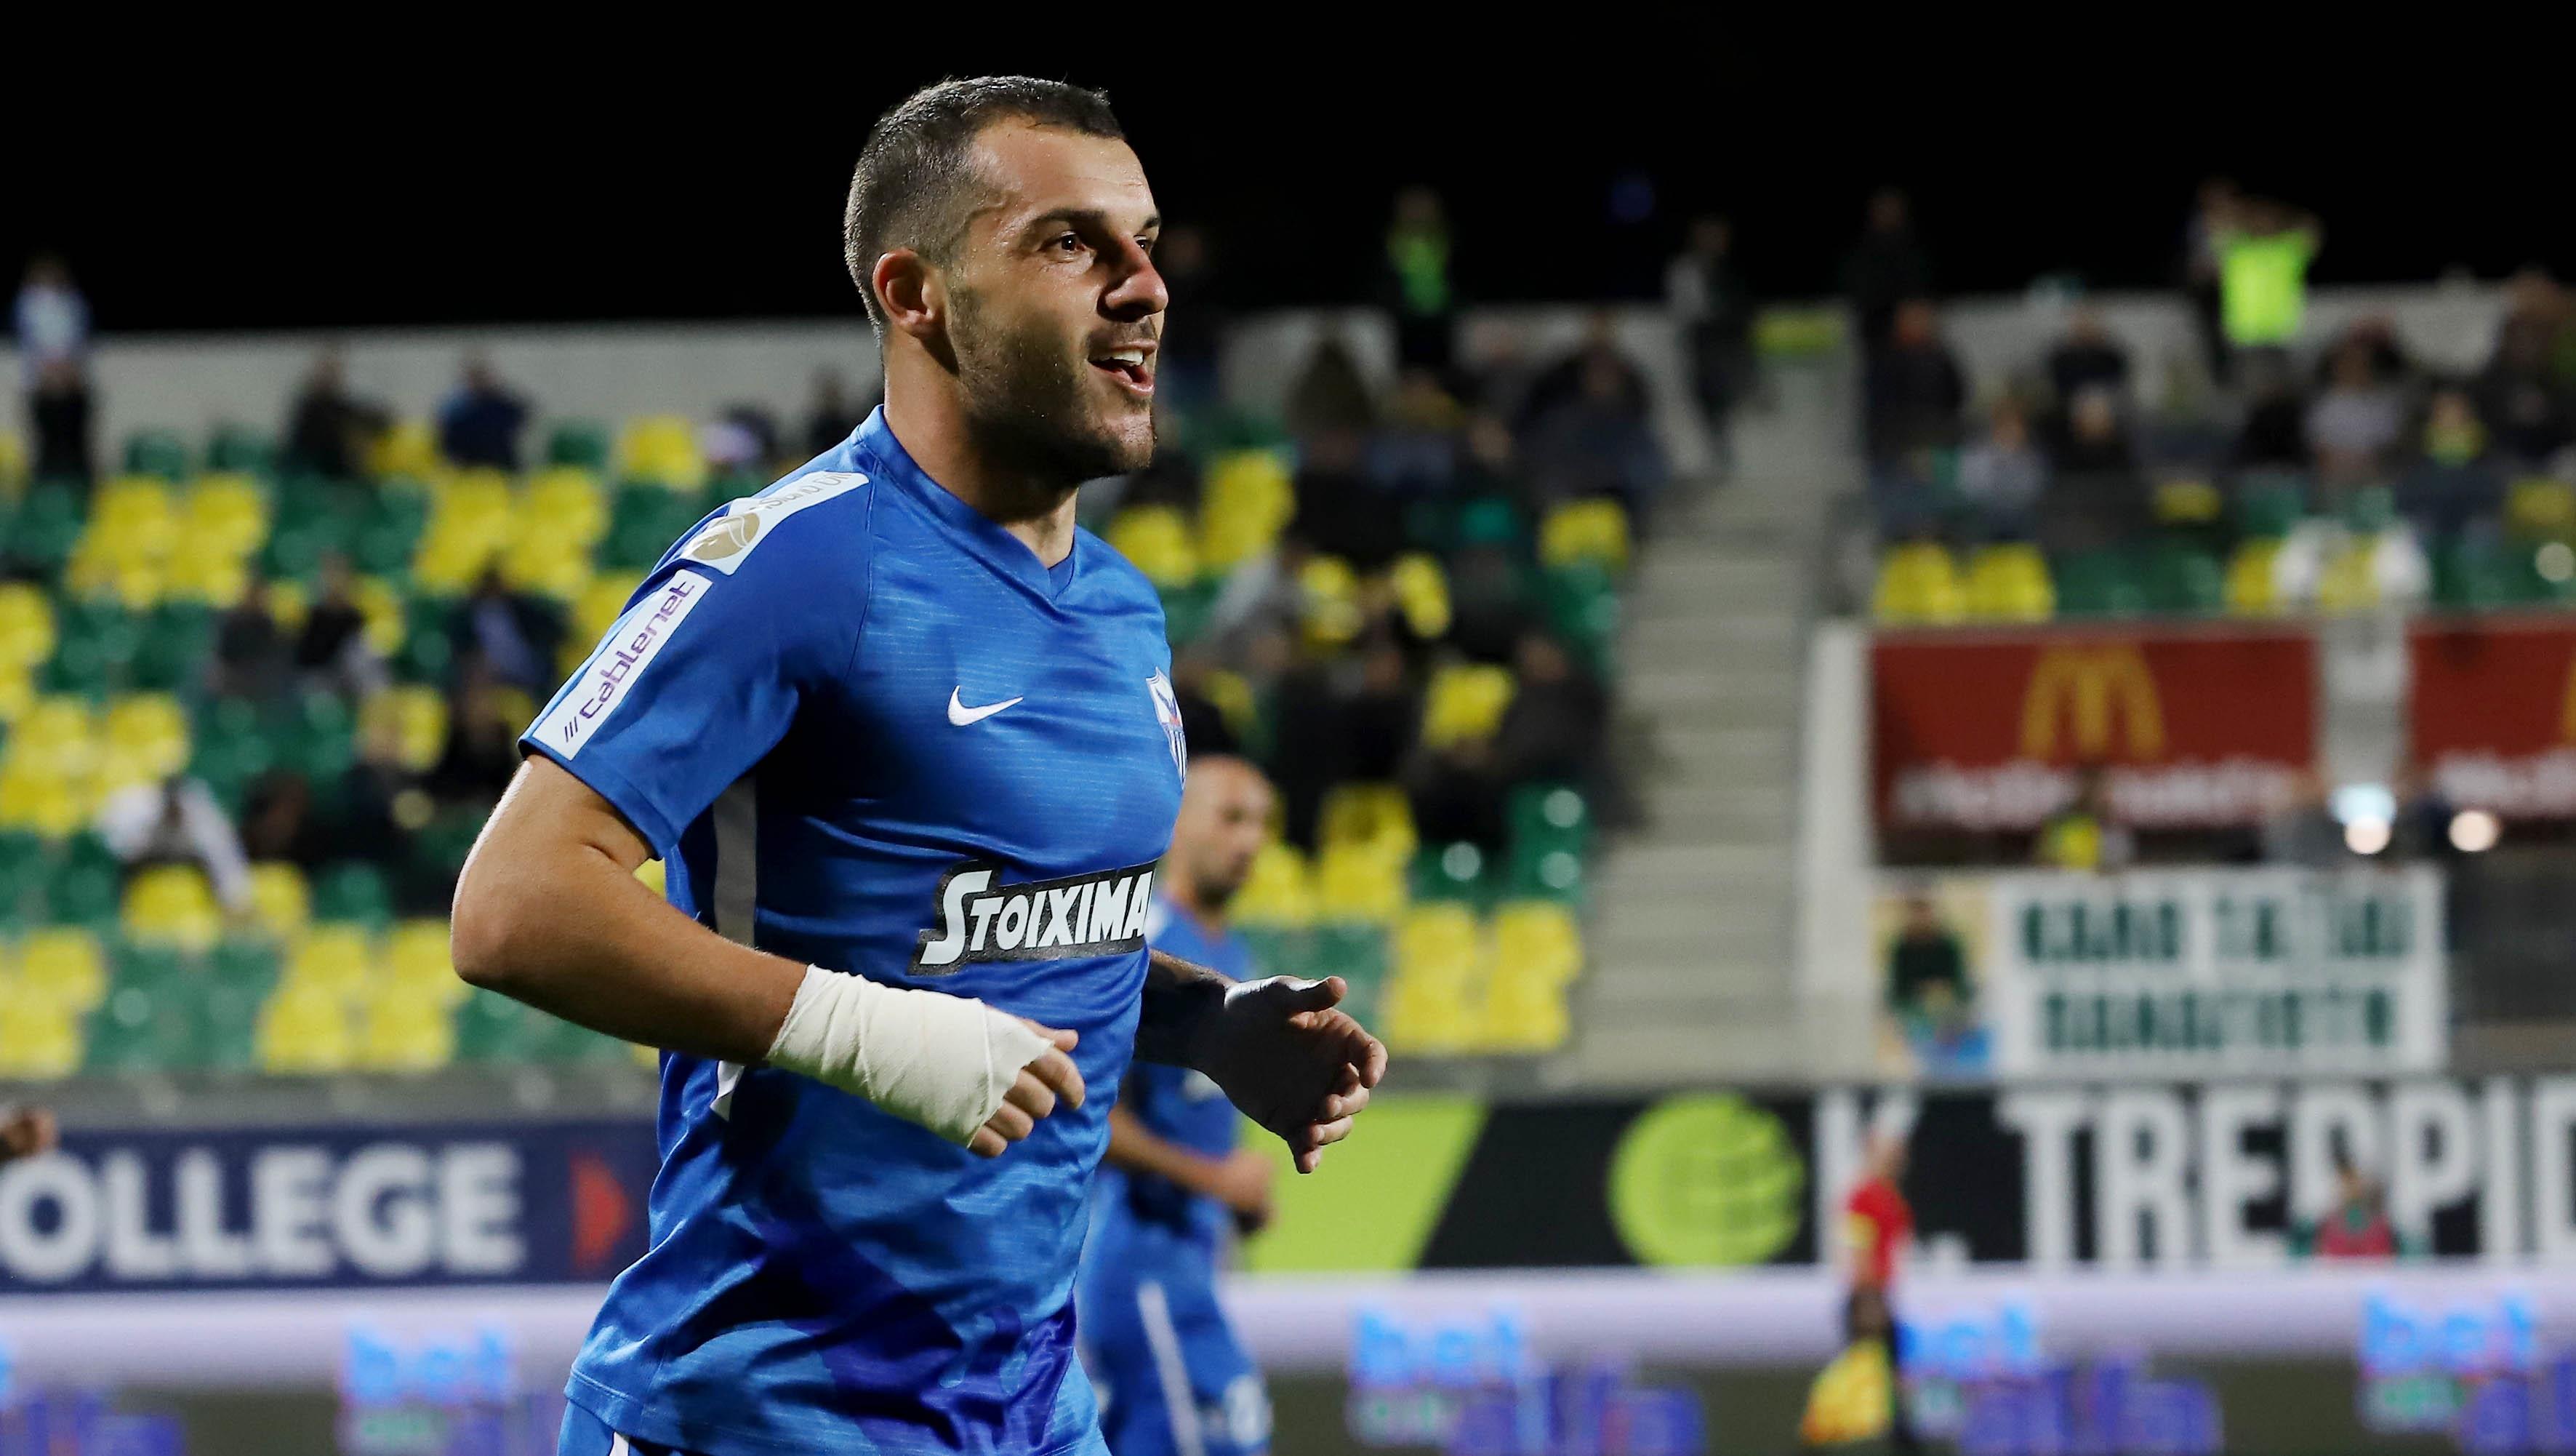 Stoiximan Top Goal 11ης Αγωνιστικής: Νίκος Καλτσάς | ΠΑΣΠ